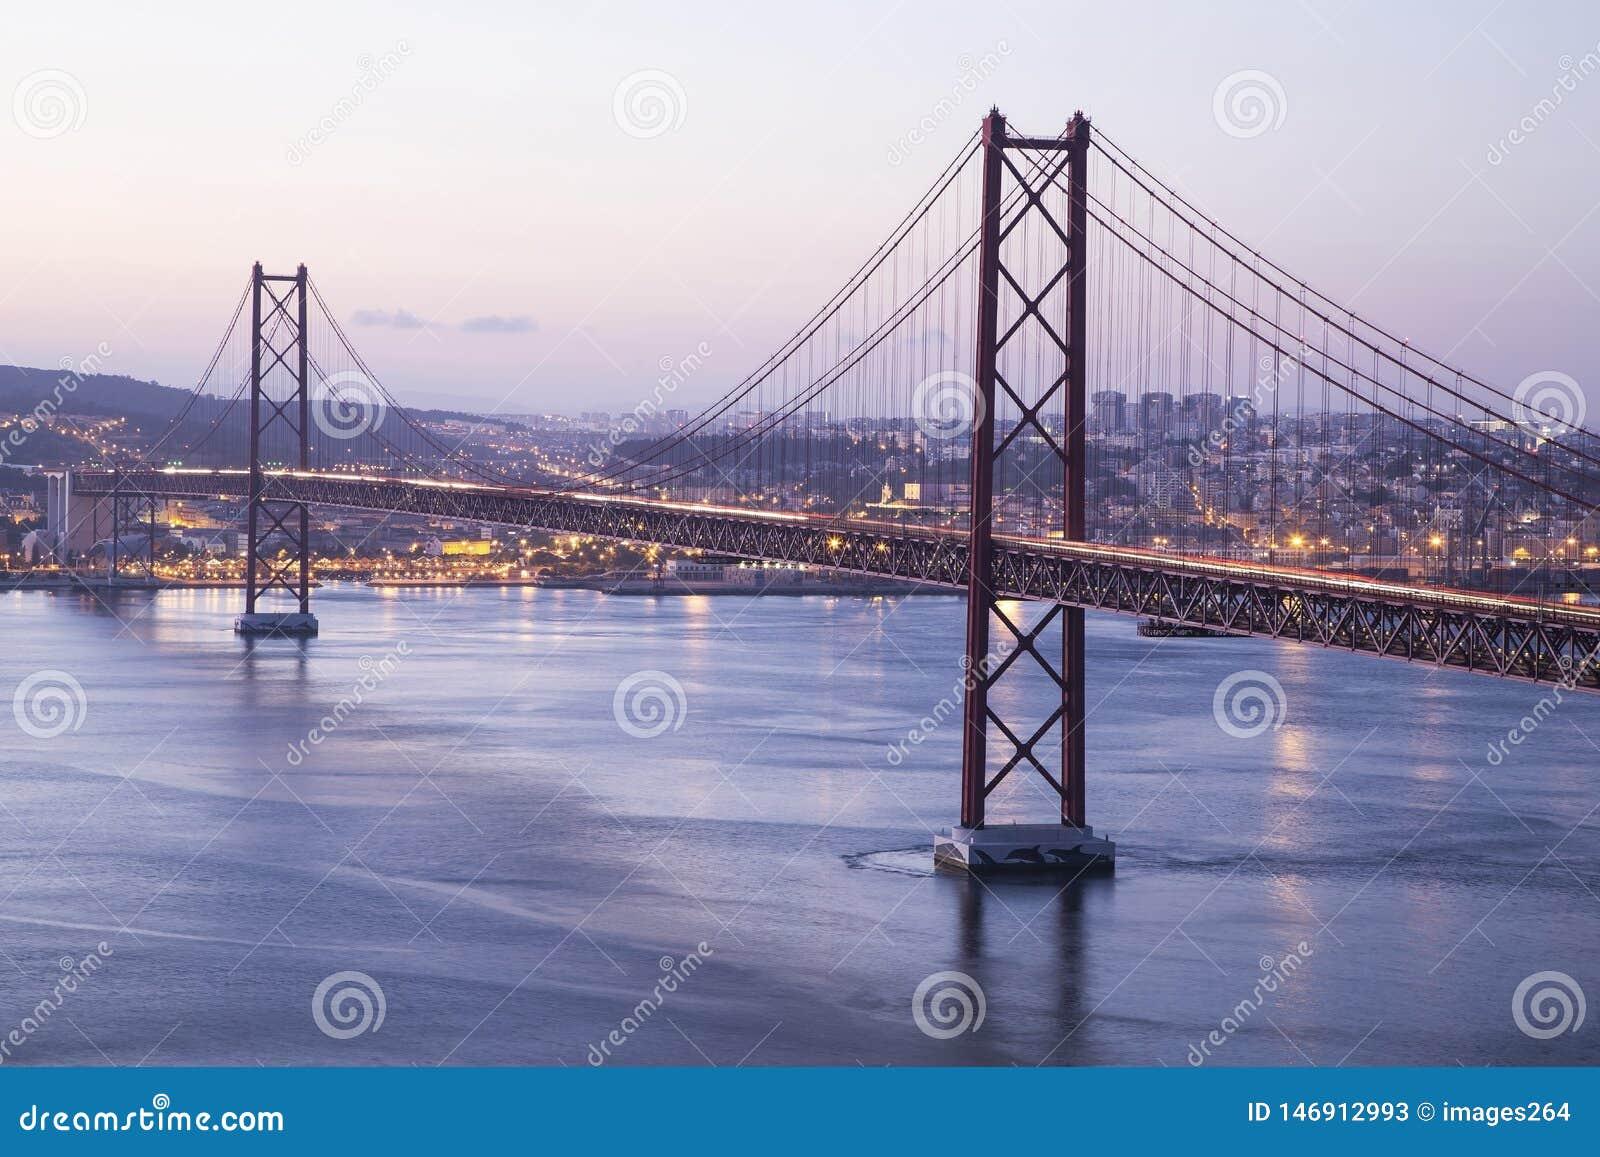 Red bridge in Lisbon